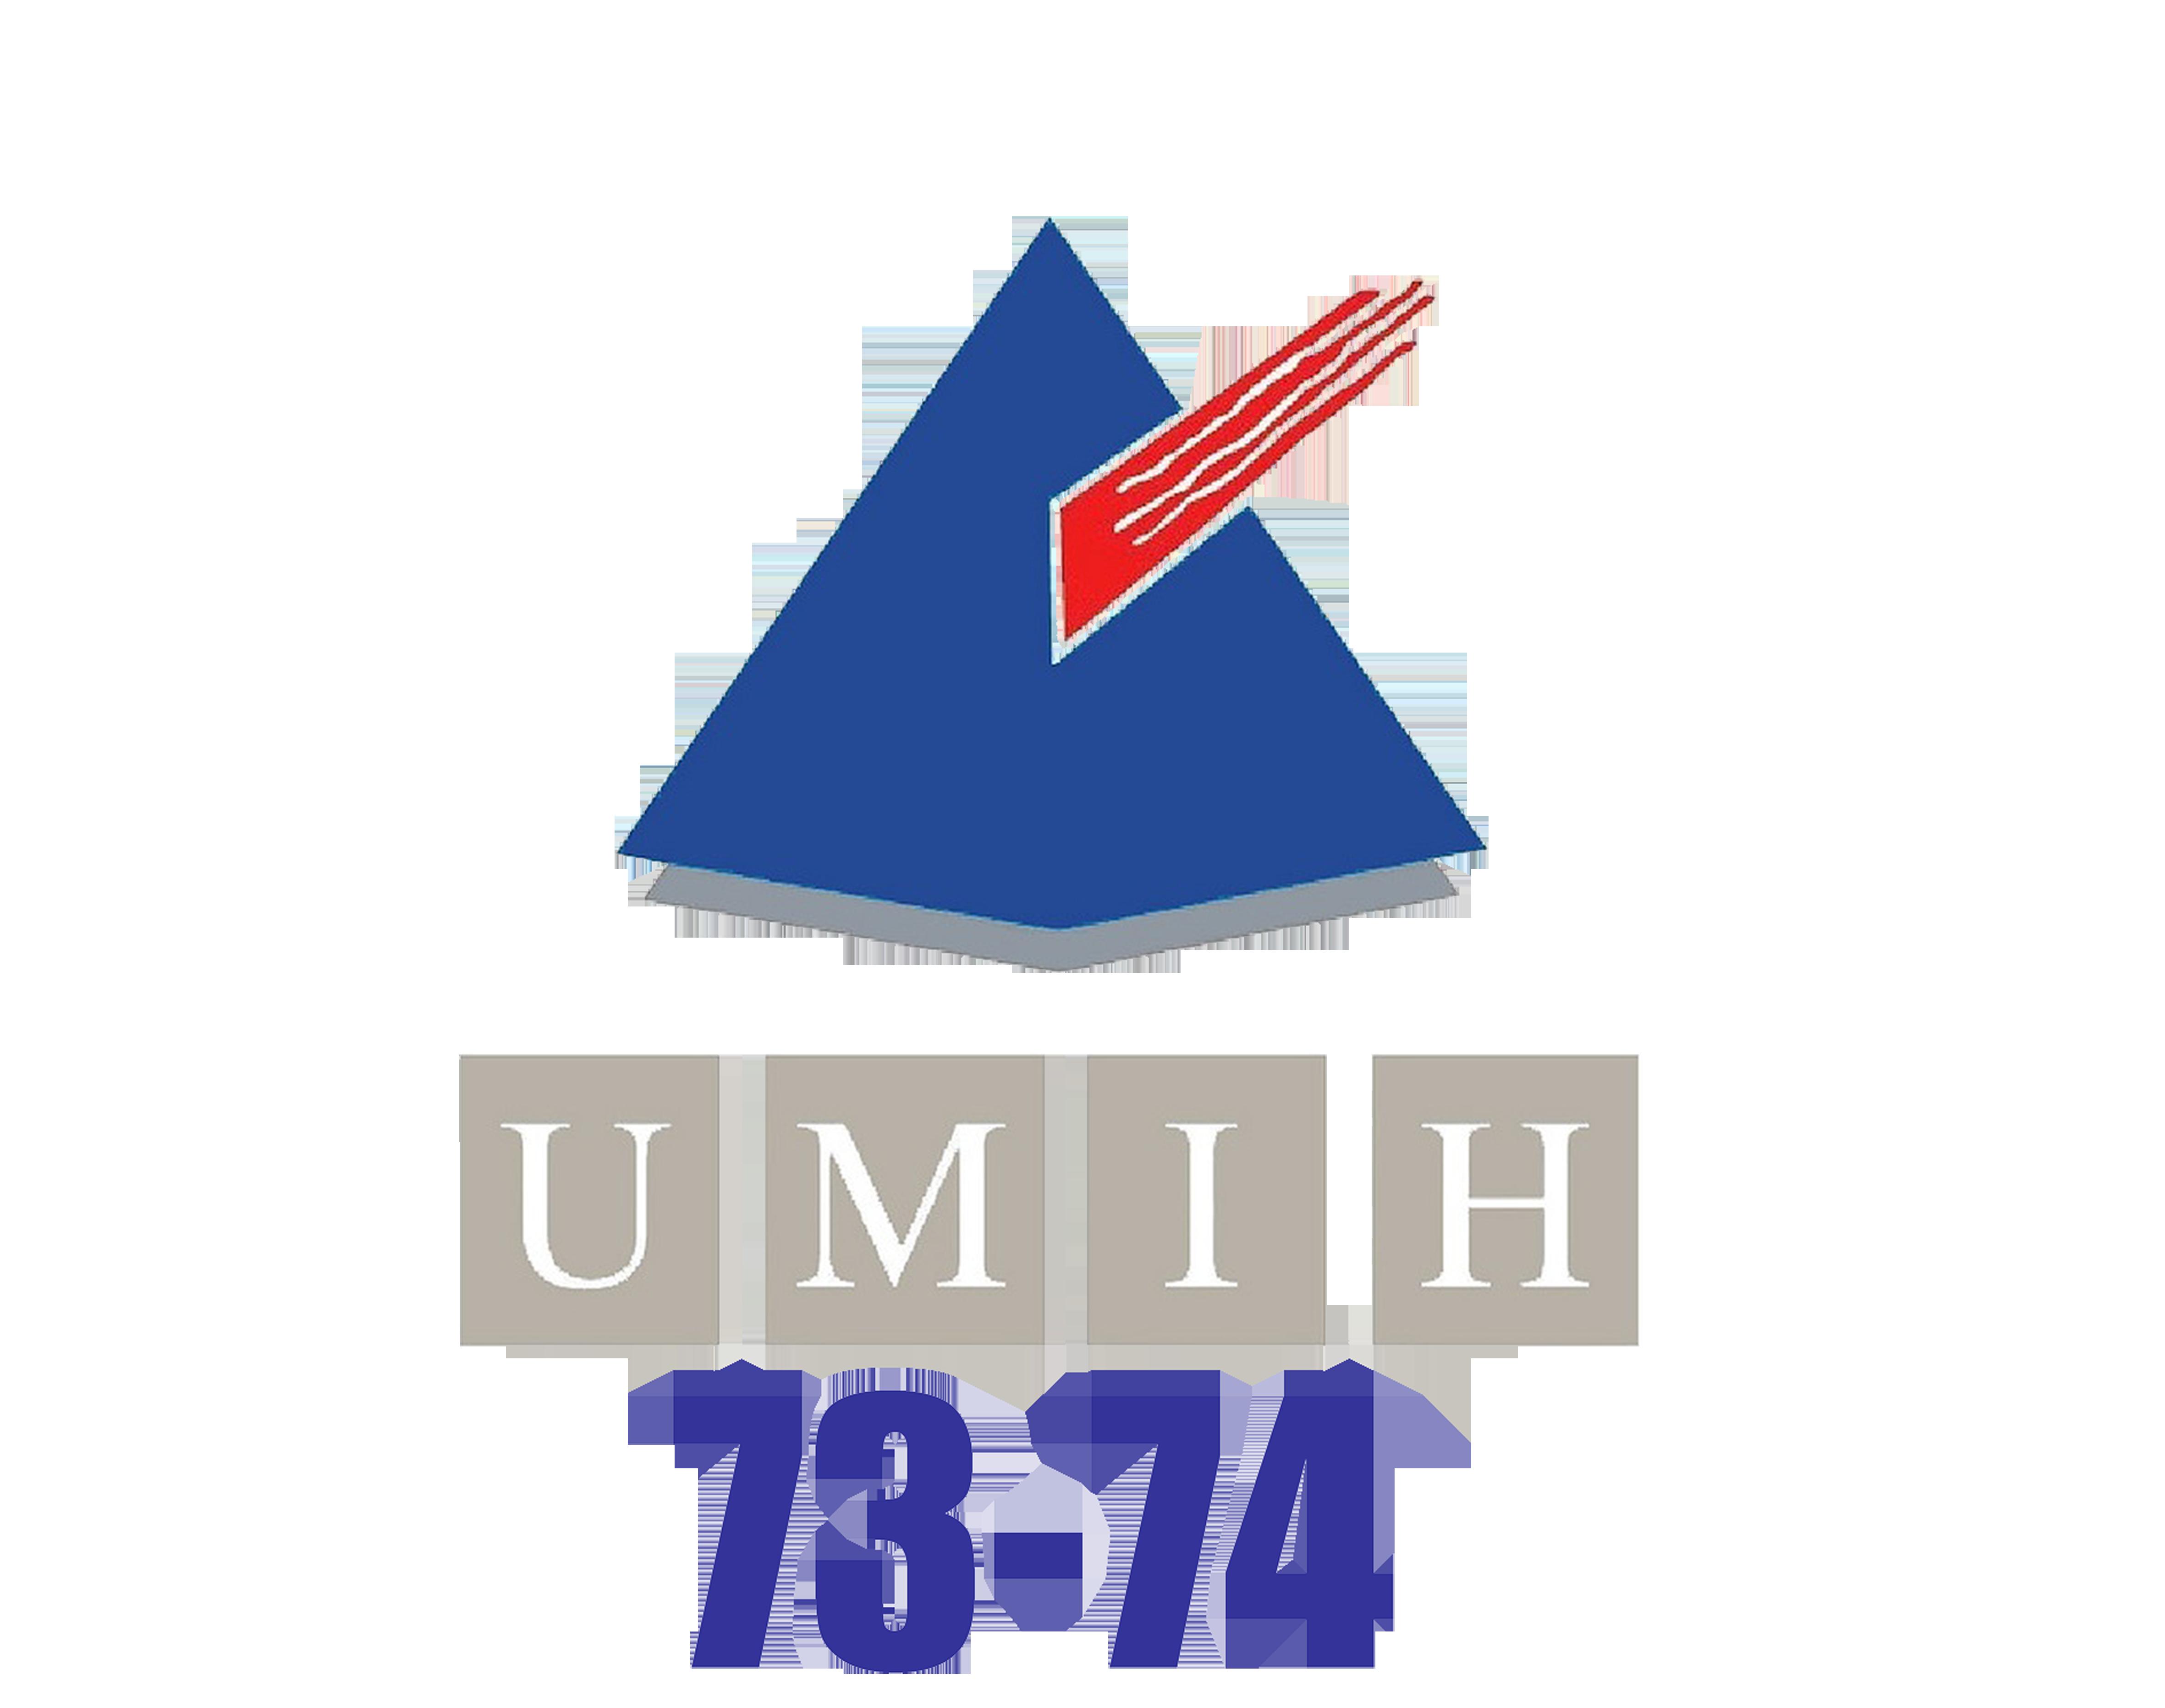 logo-umih-de-Savoie-et-Haute-Savoie